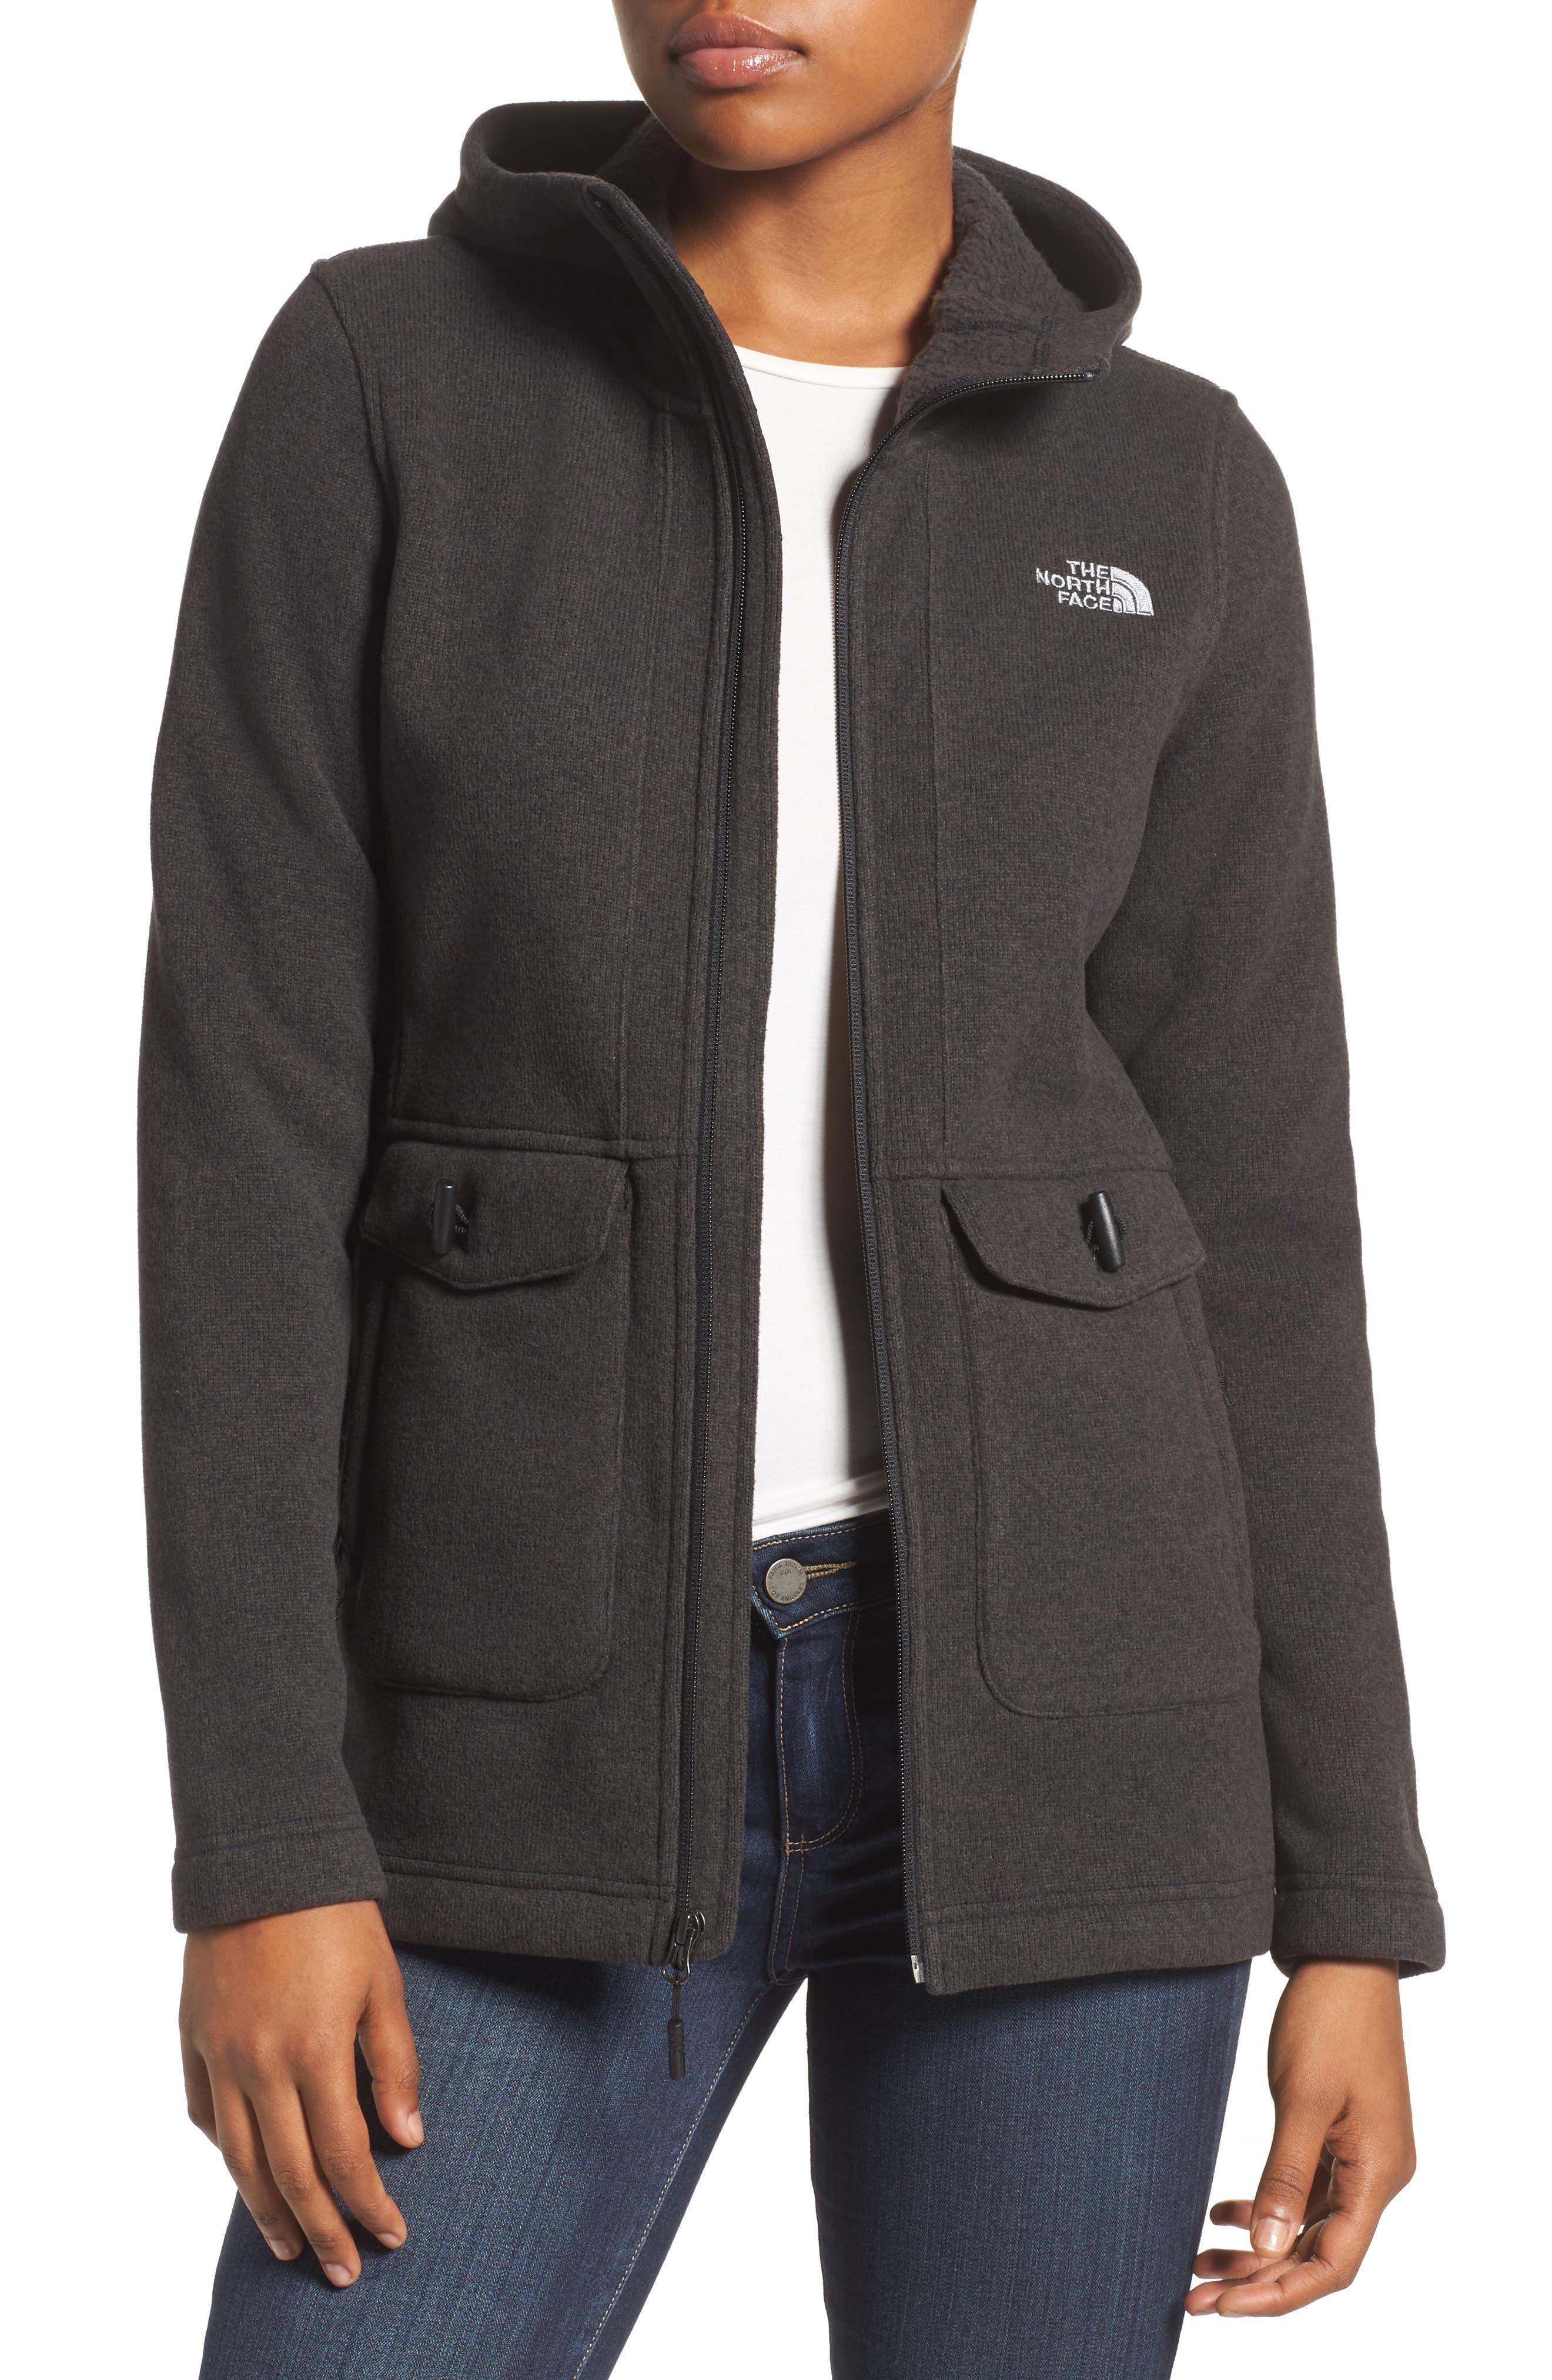 Crescent Parka Fleece,                         Main,                         color, Tnf Black Heather